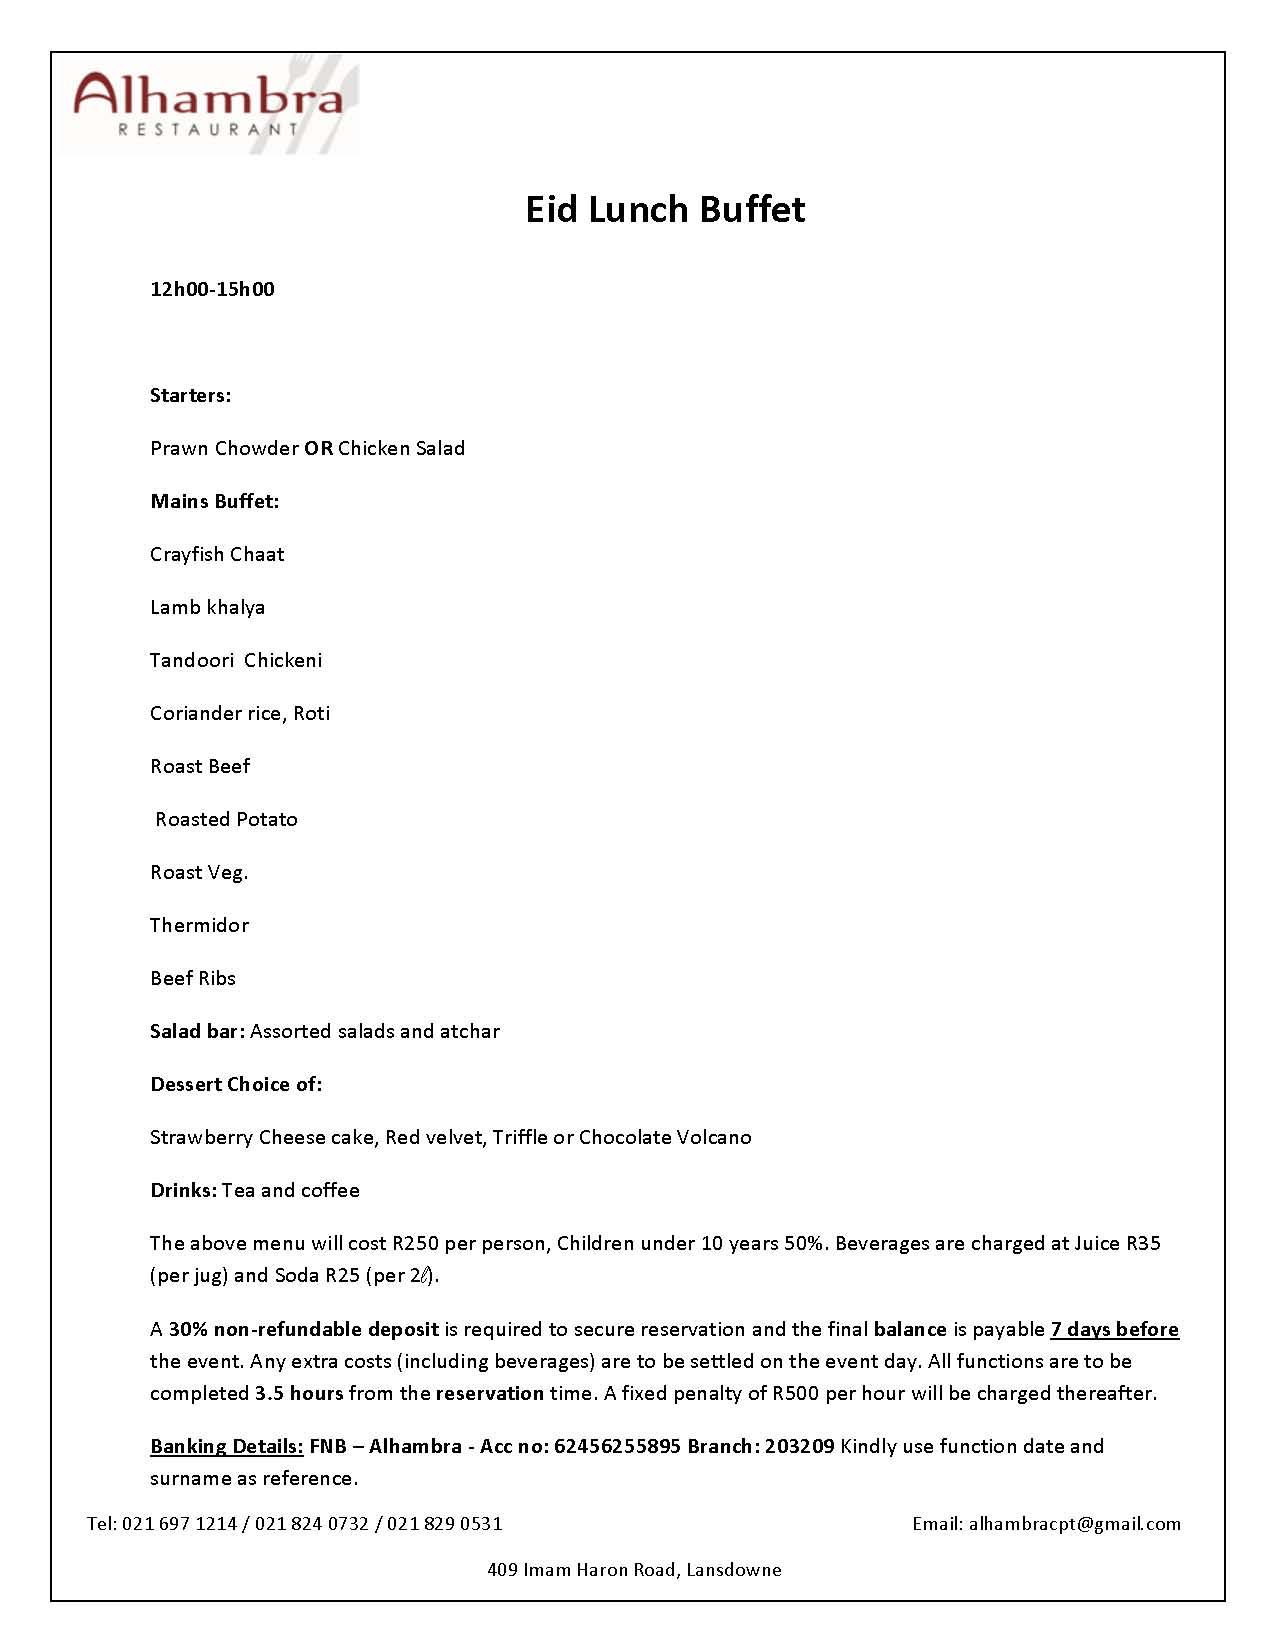 Alhambra 2017 EID Lunch Buffet Menu